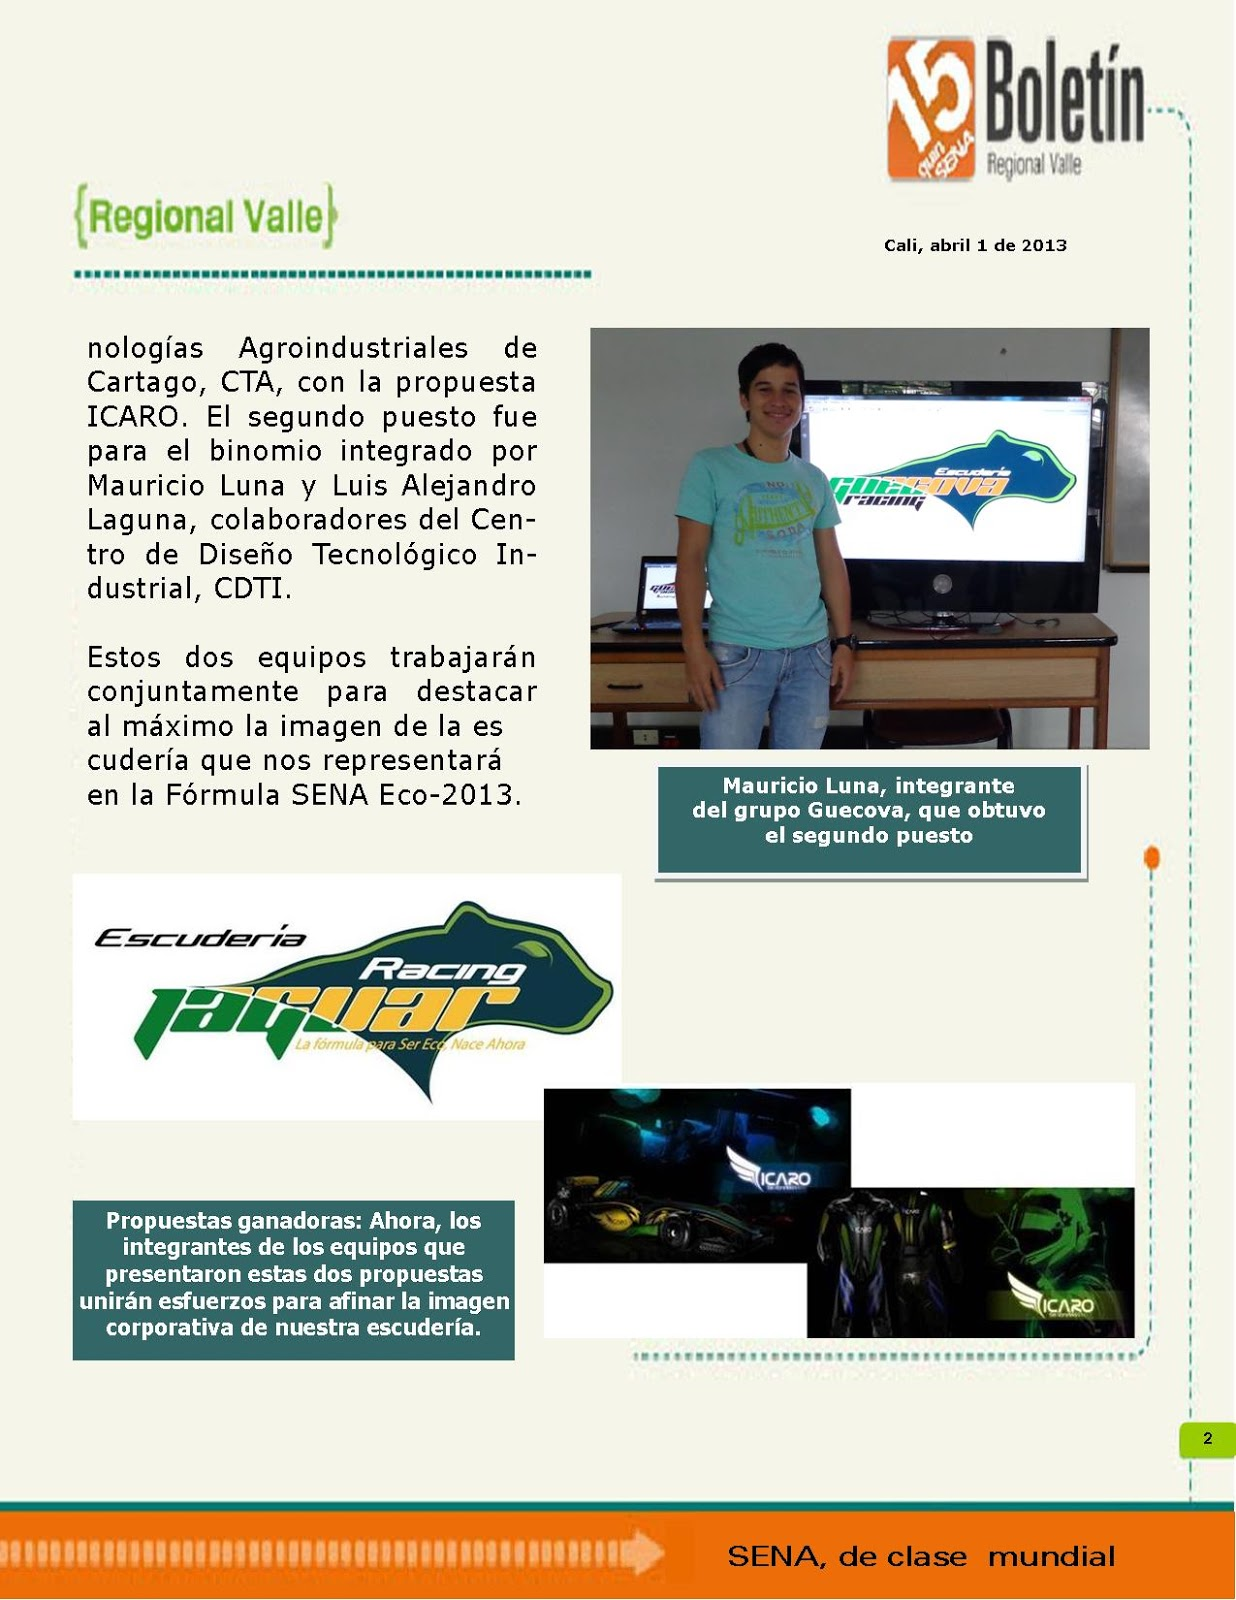 Centro latinoamericano de especies menores formula sena eco for Serna v portales